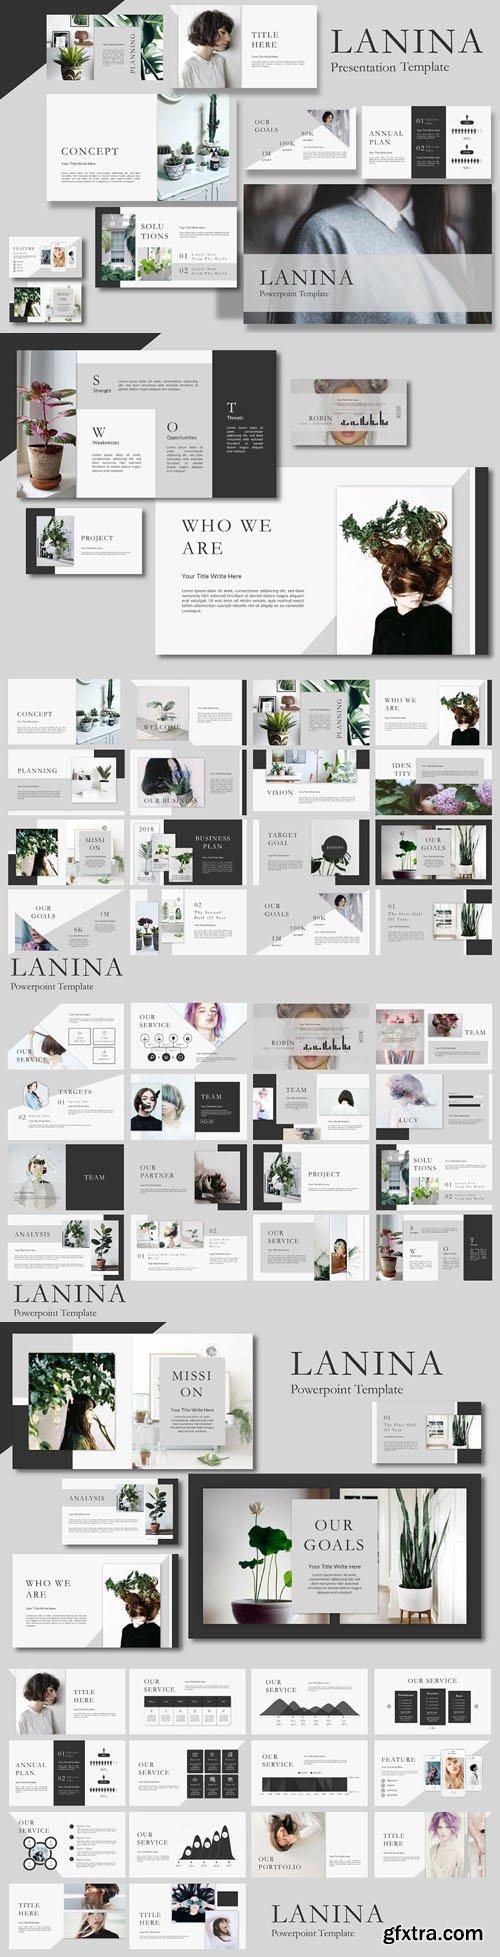 Lalina Presentation Template [PPTX/KEY]